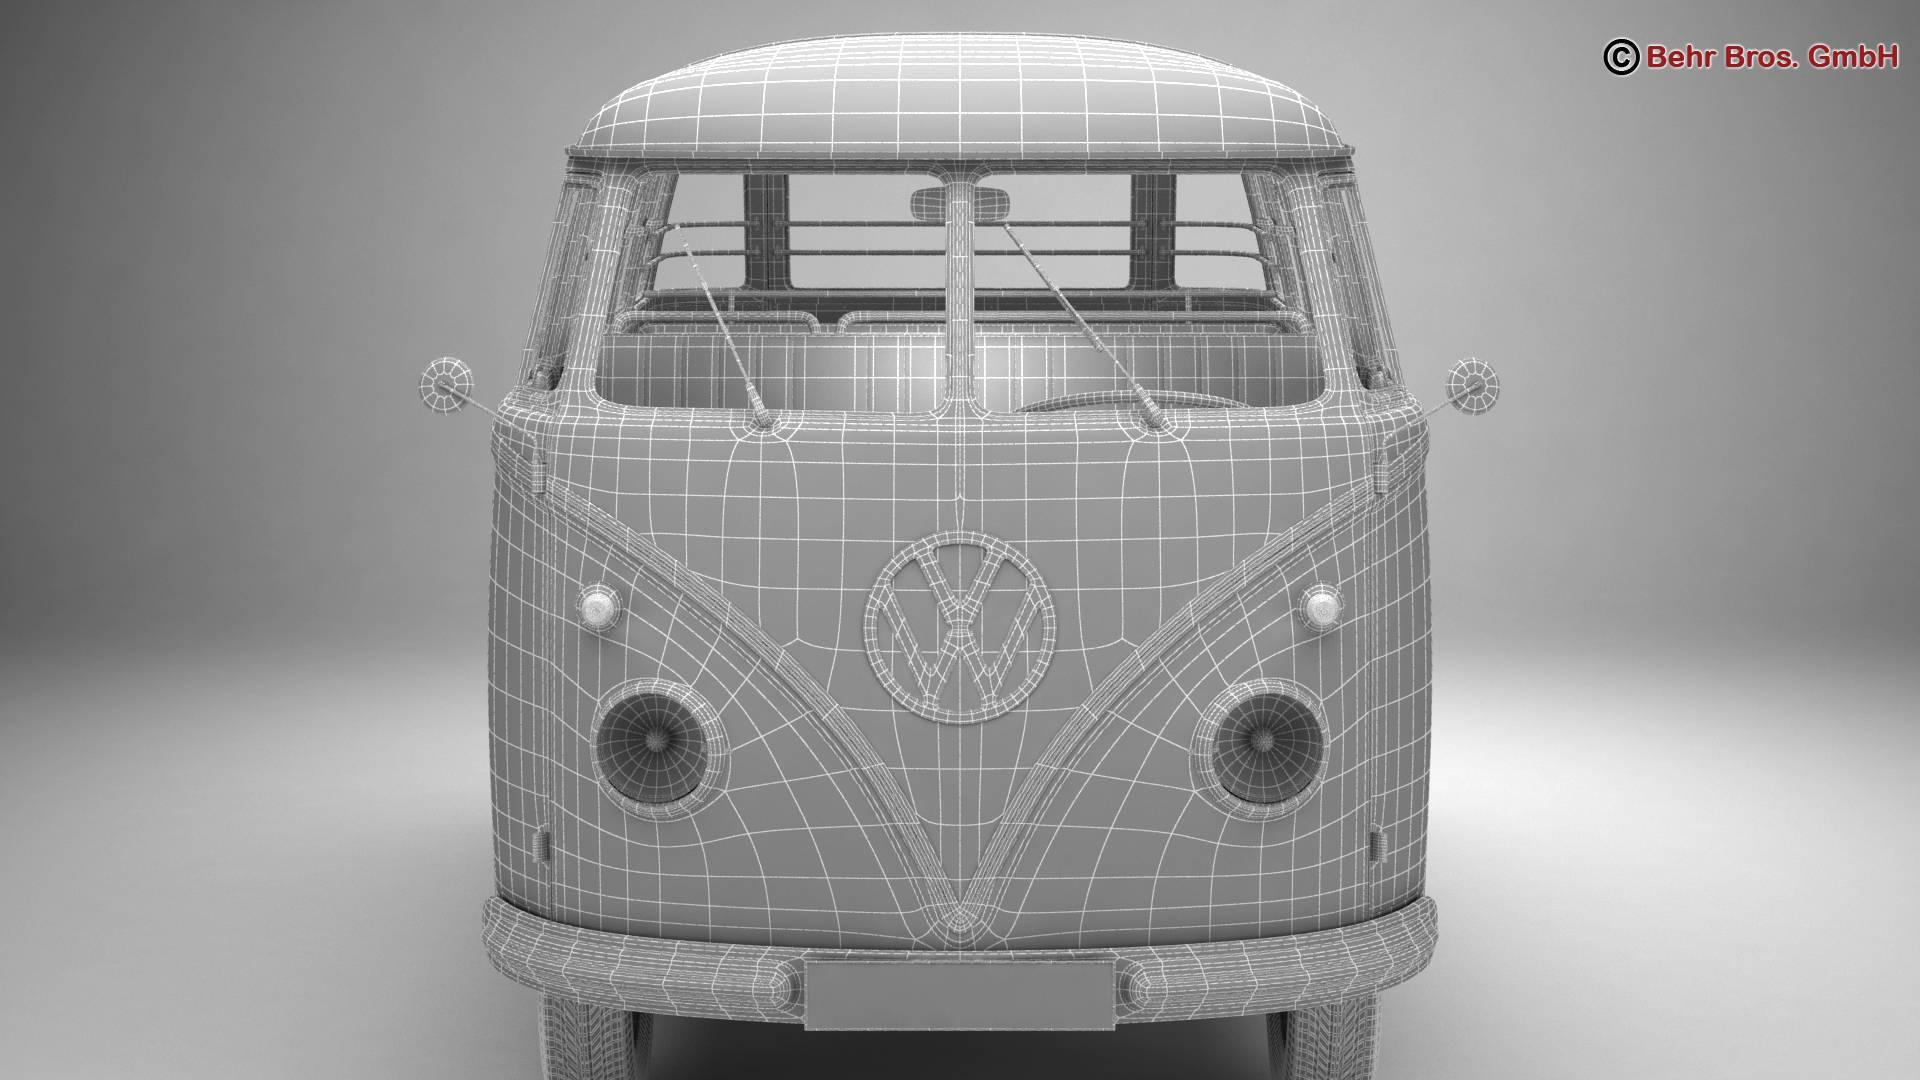 volkswagen type 2 samba 1959 3d model 3ds max fbx c4d lwo ma mb obj 217127